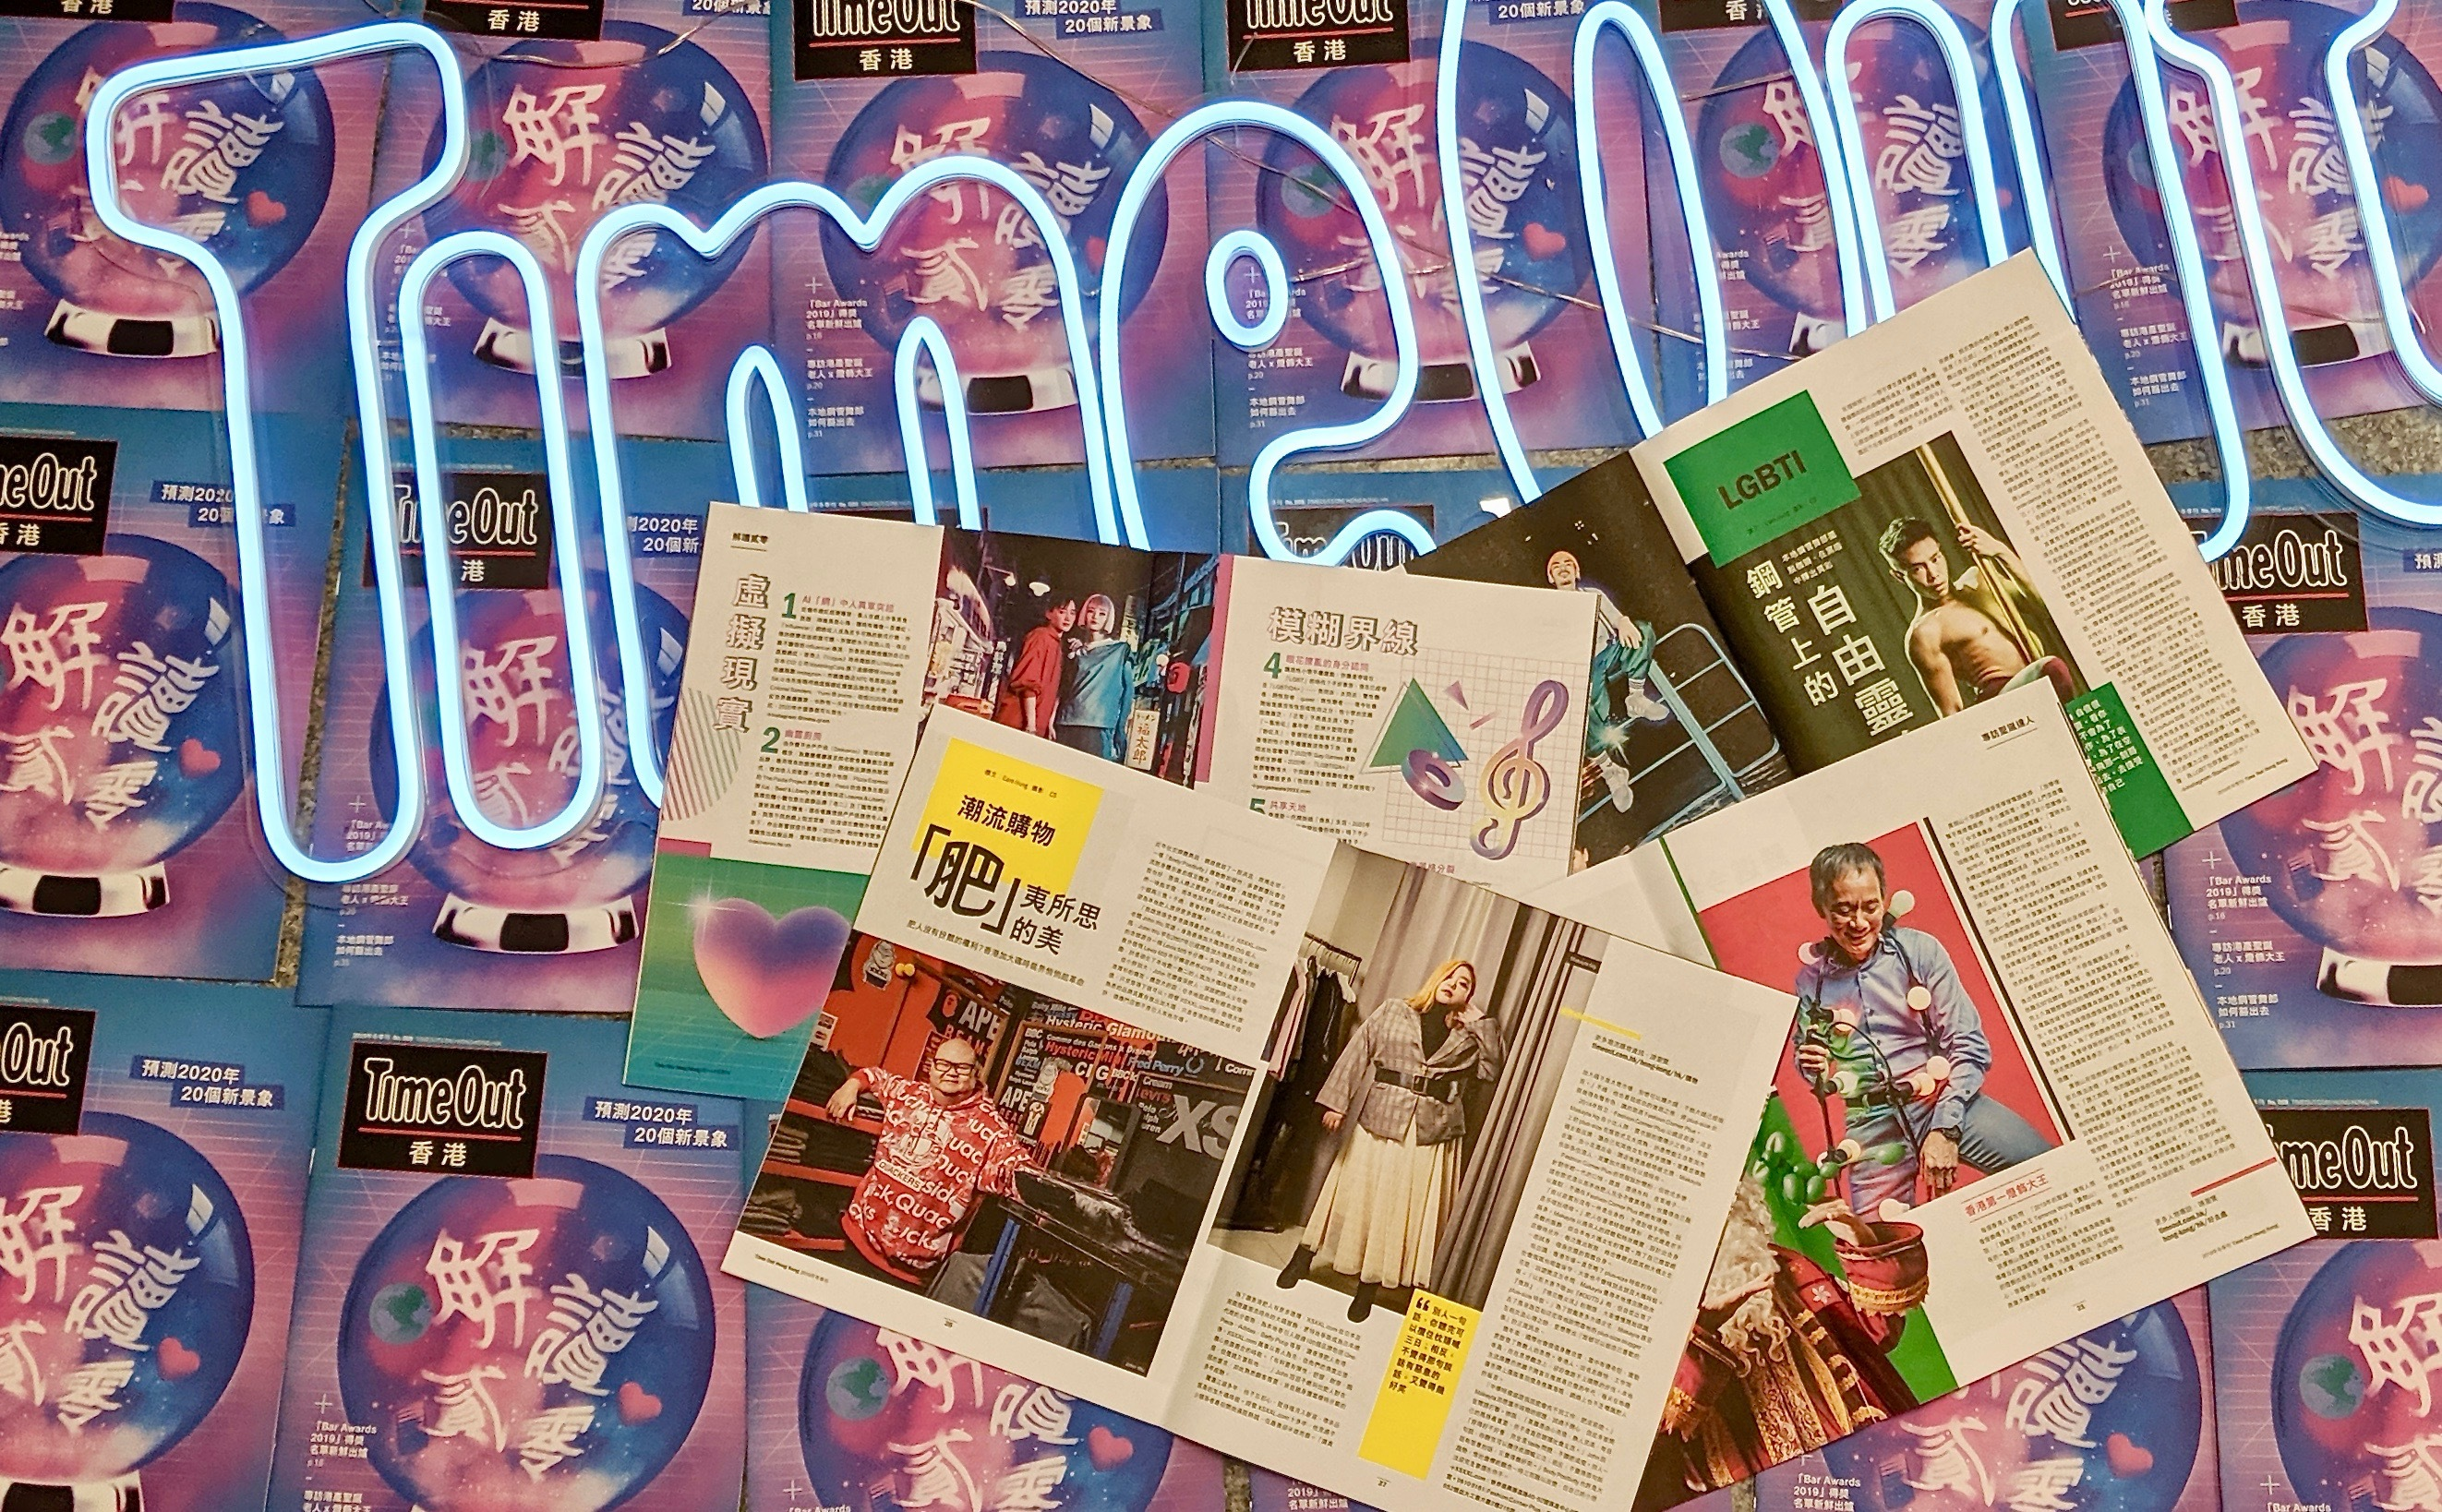 《Time Out 香港》雜誌冬季刊今週五免費派發